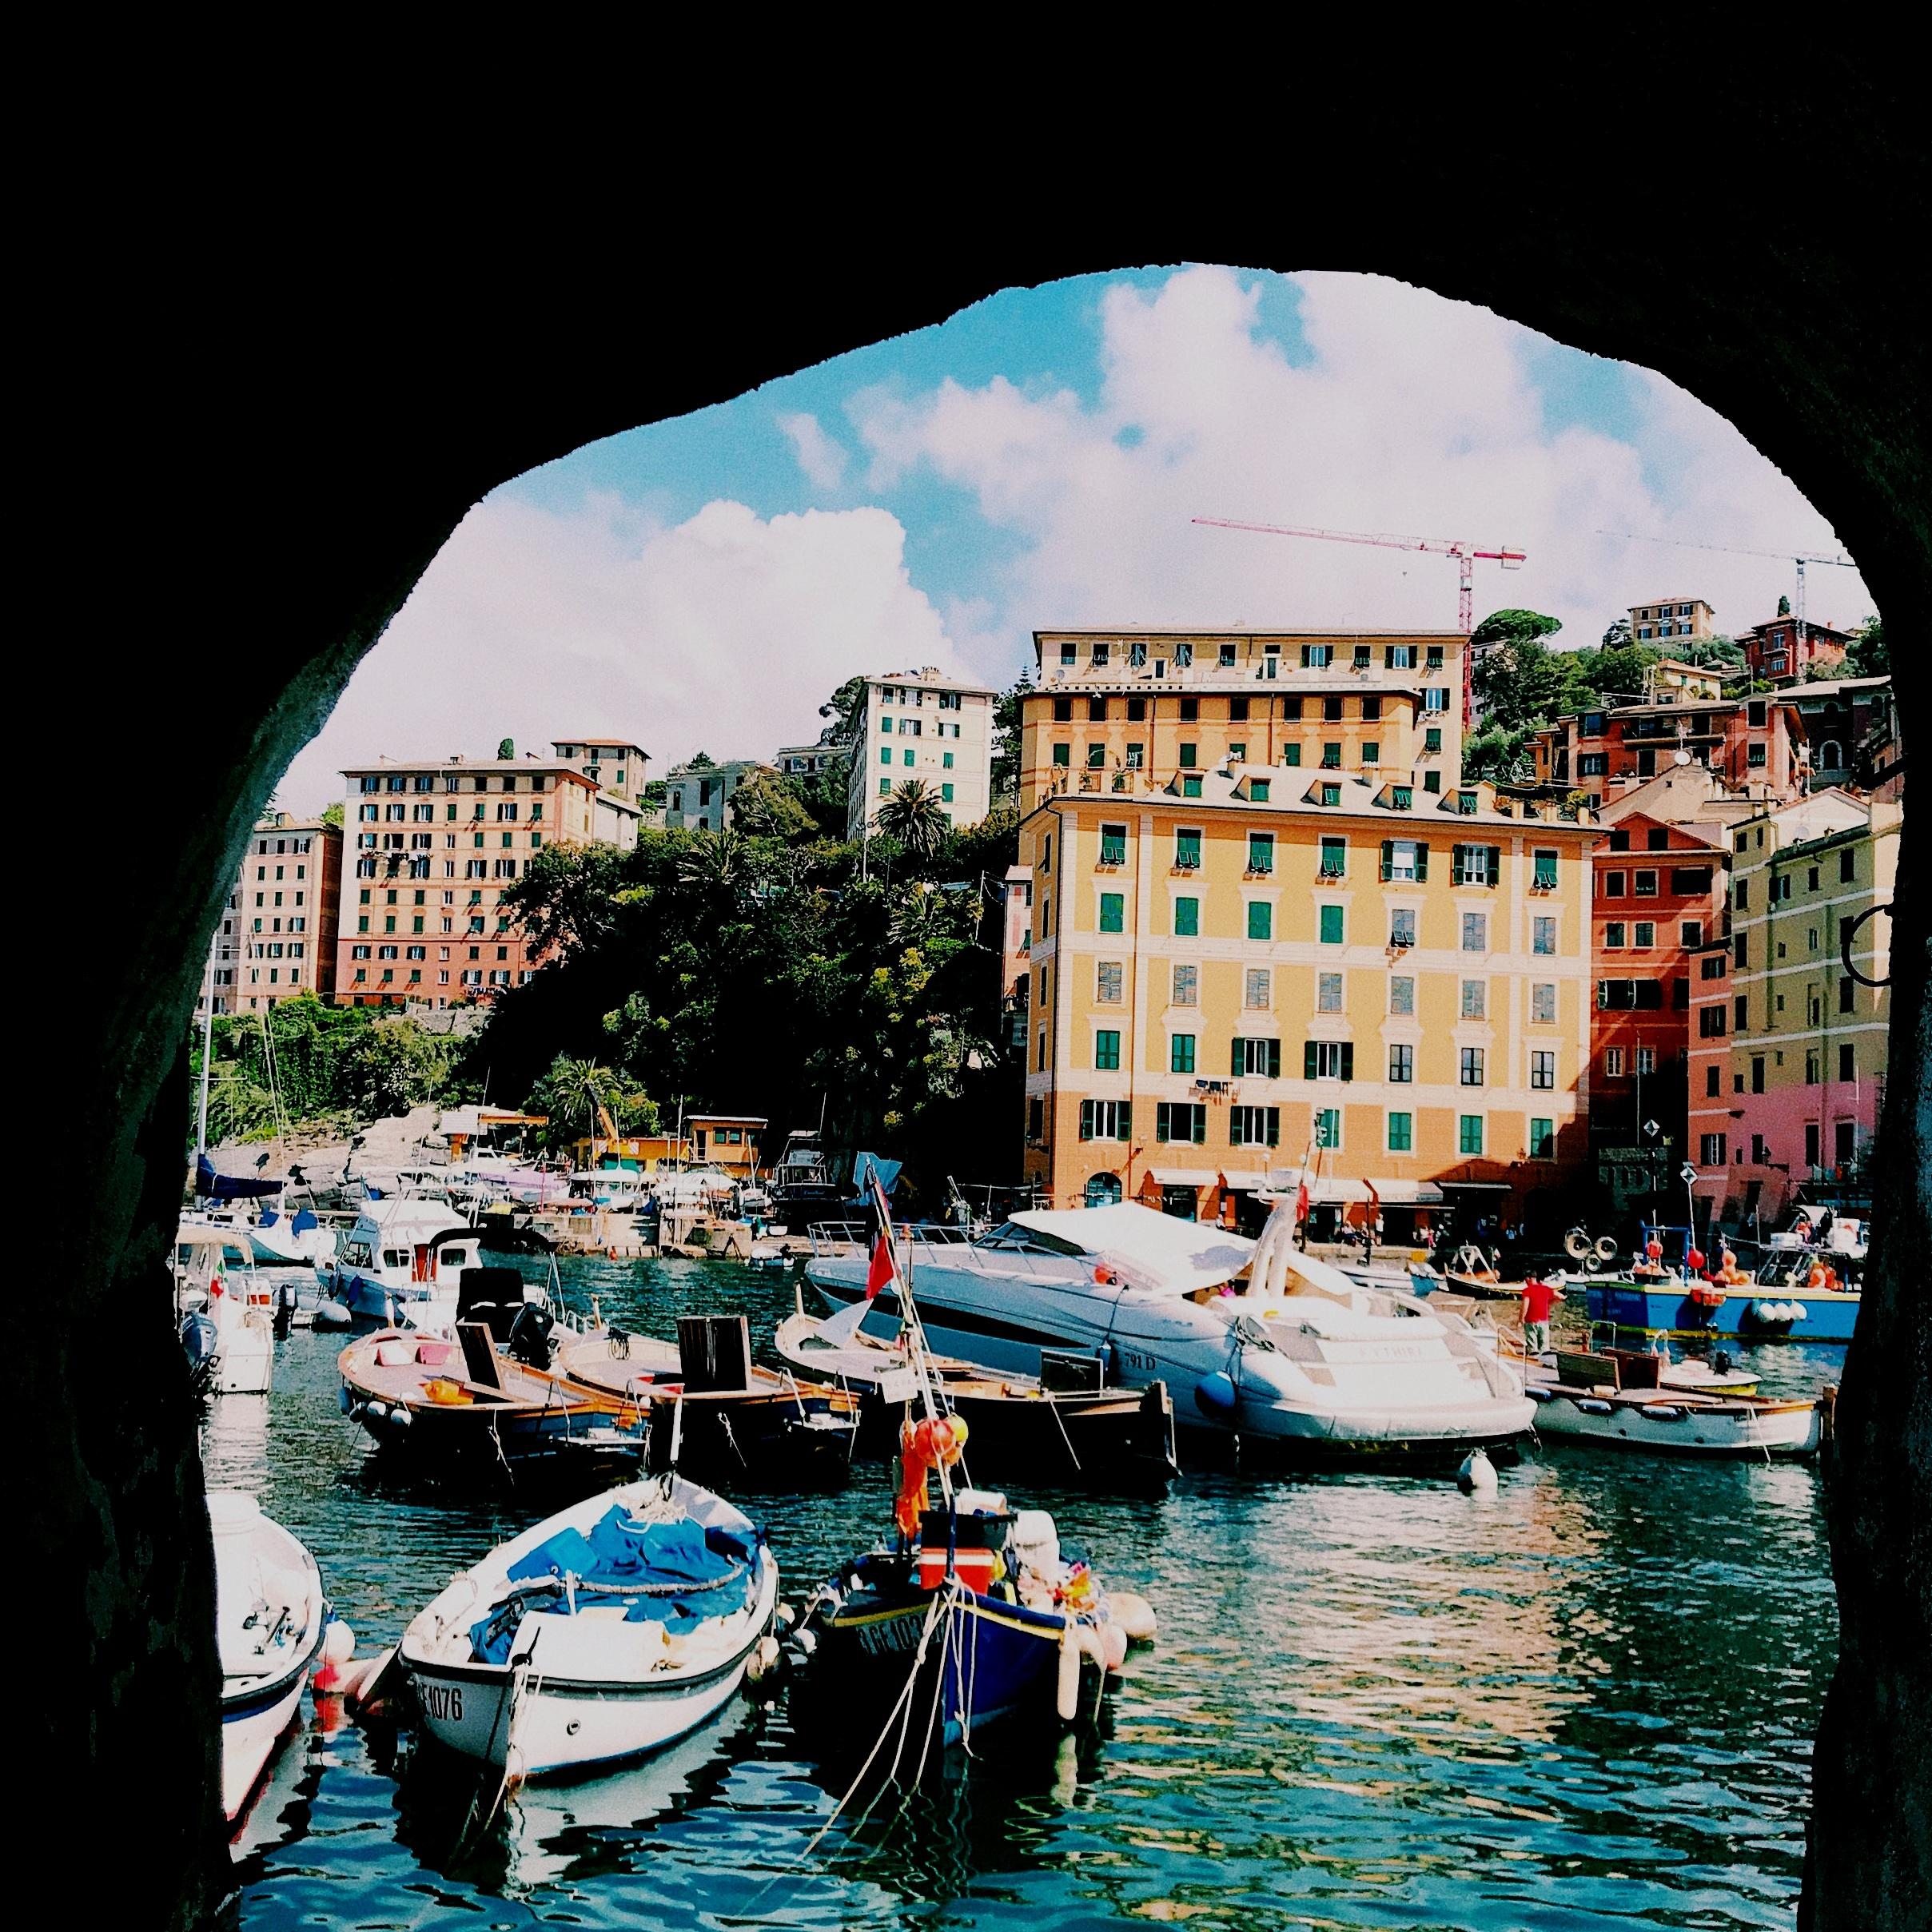 Slow Fish 2019:A Walk through an Italian Port City - Recap by Jordyn Kastlunger, Slow Fish Co-Chair